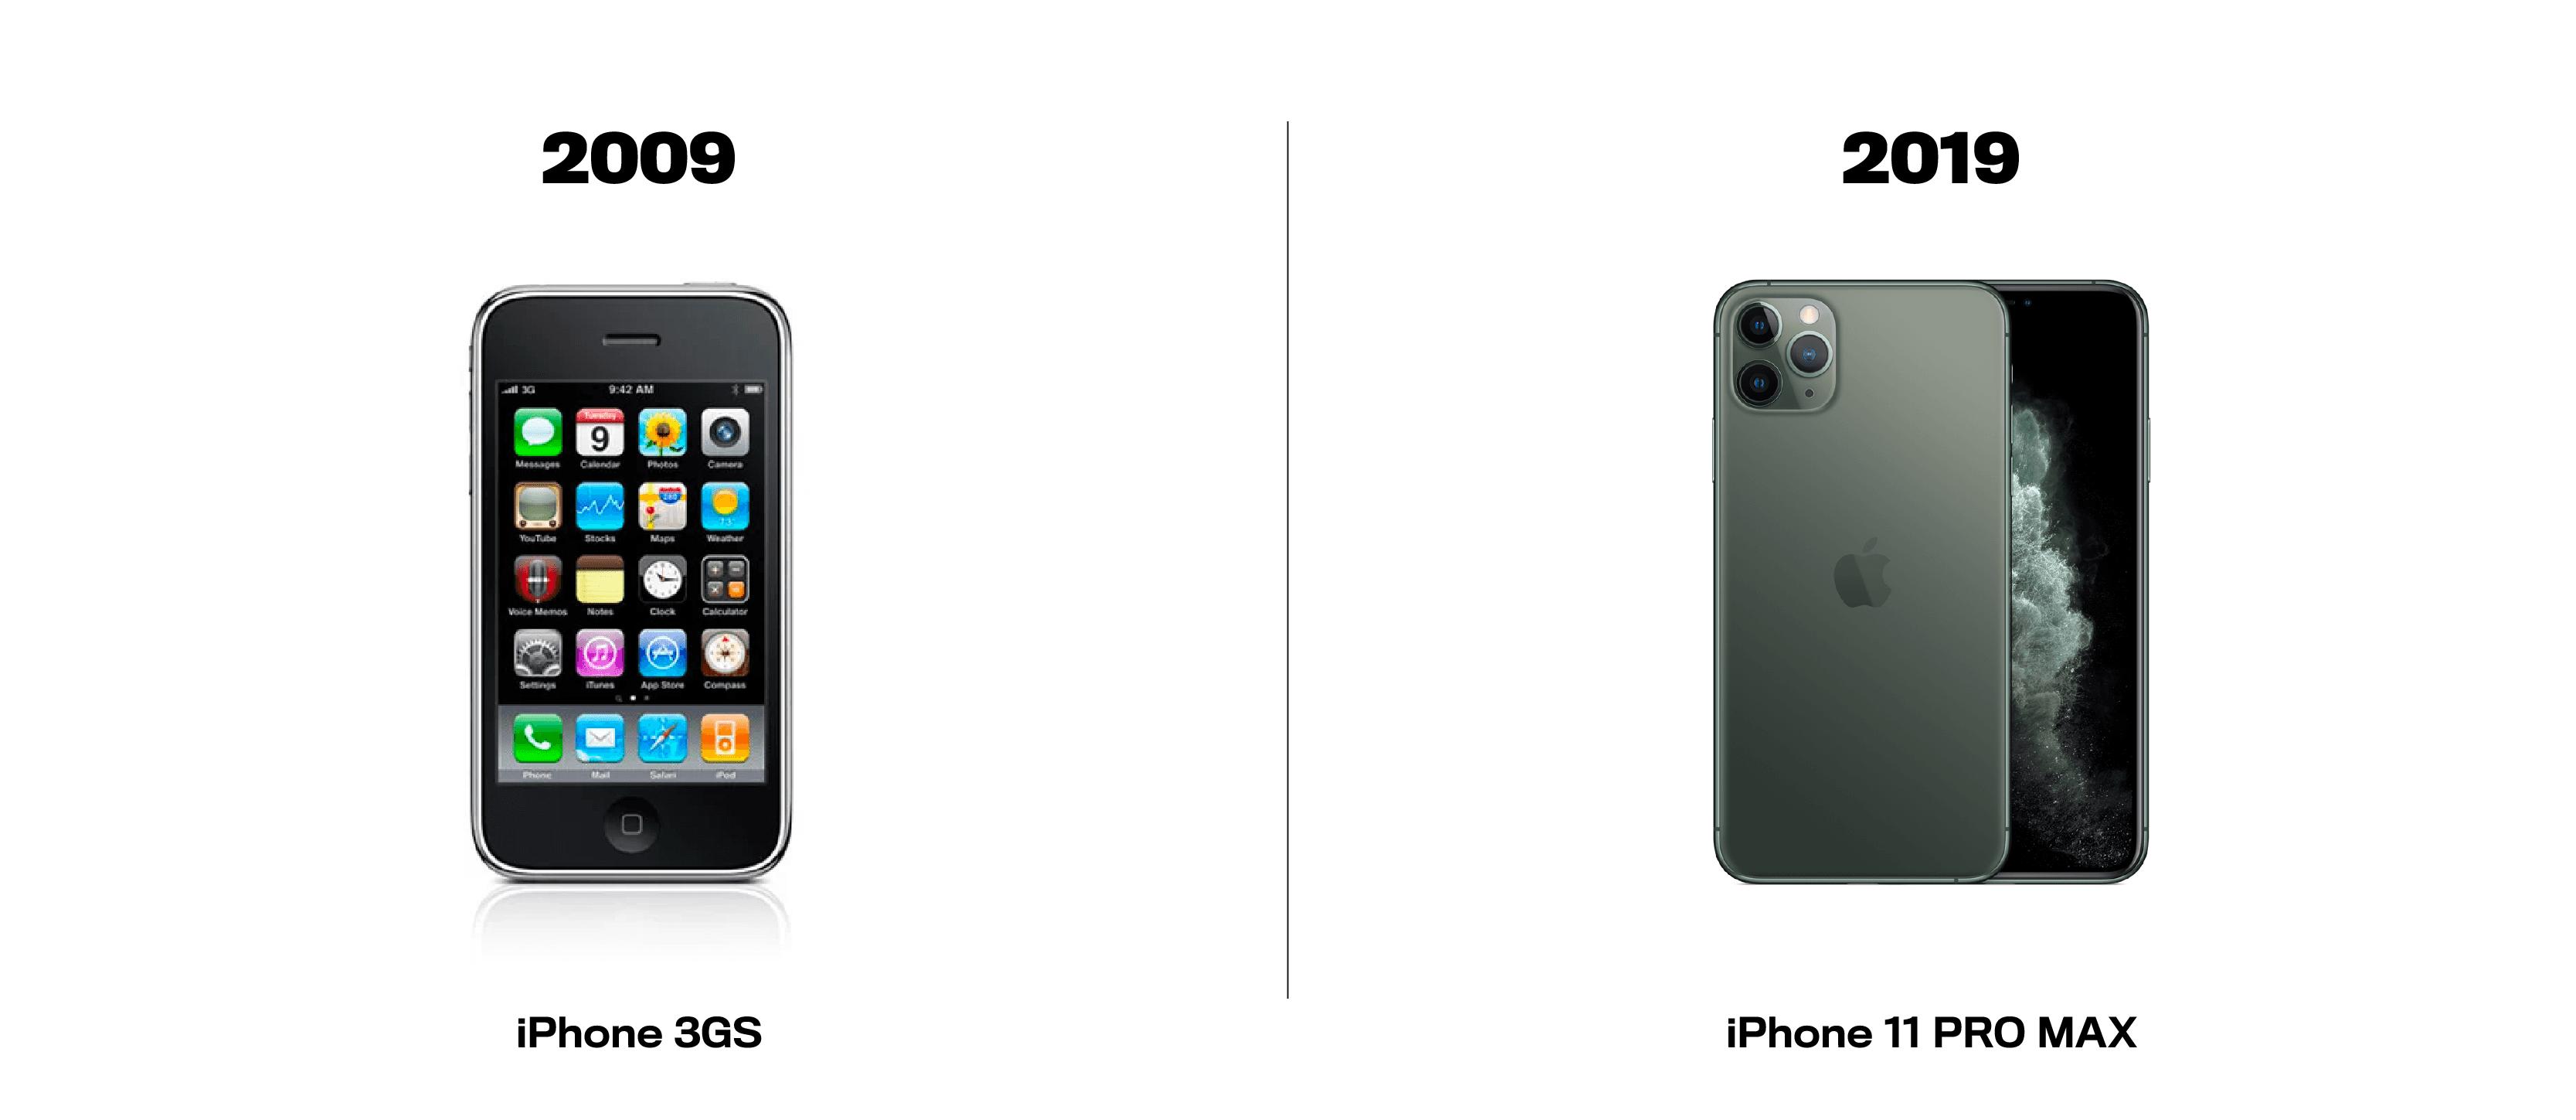 iPhone-3Gs-vs-iPhone-11-max-pro-2009-vs-2019